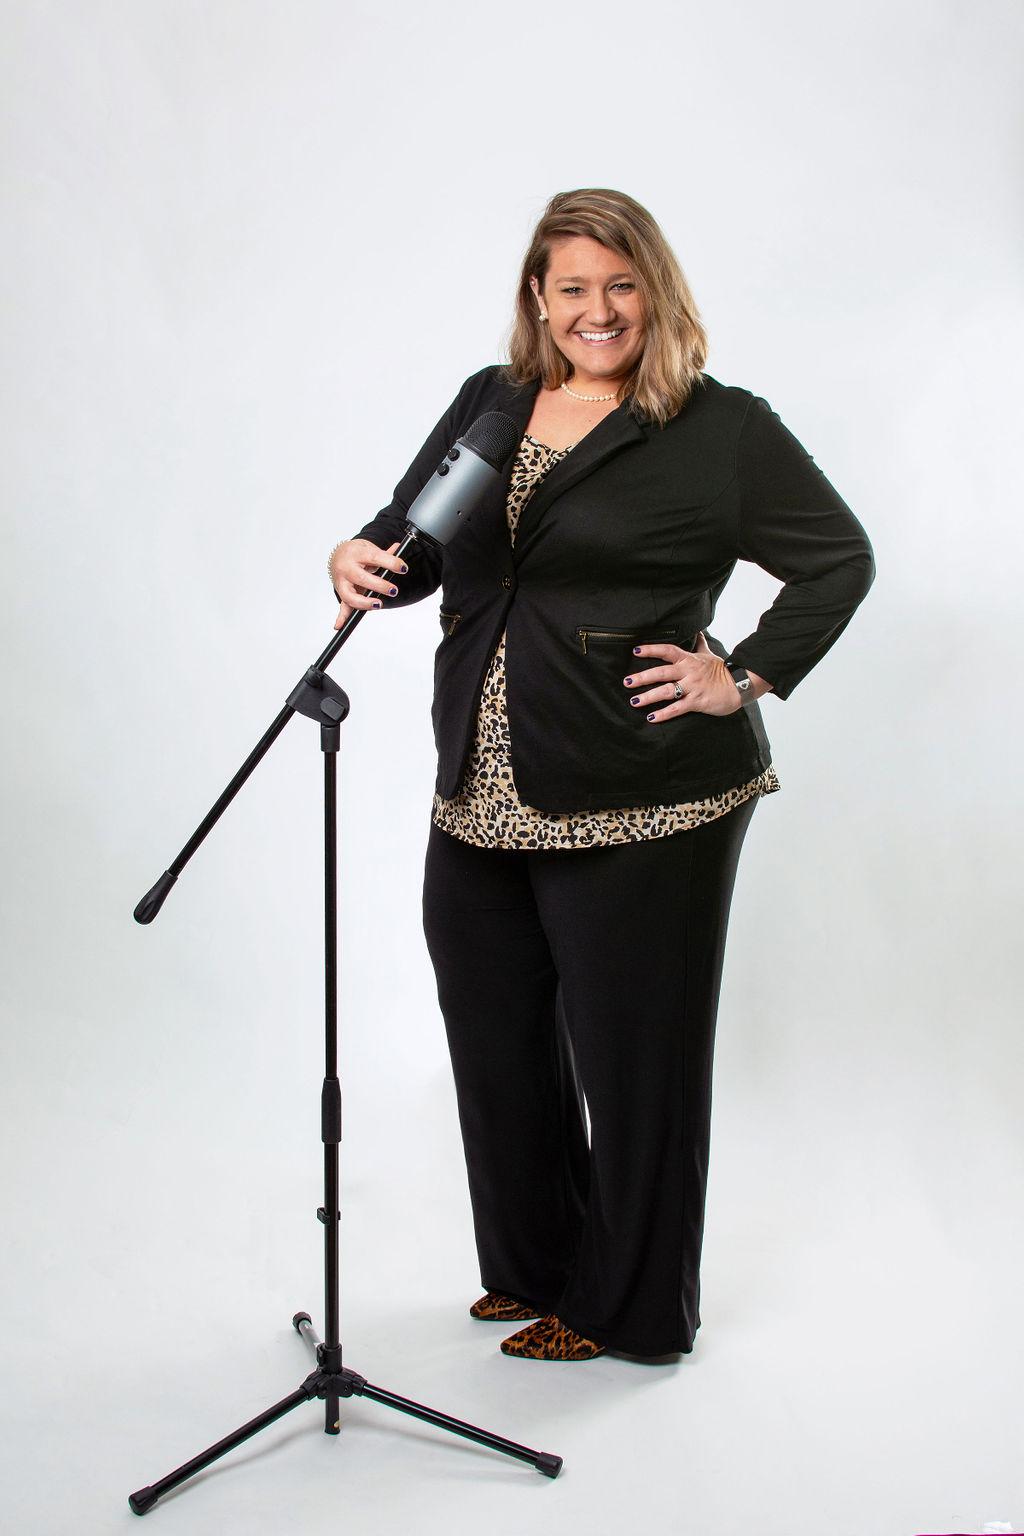 Terri Watkins, Speaker and creator of TERRIfic Tips podcast